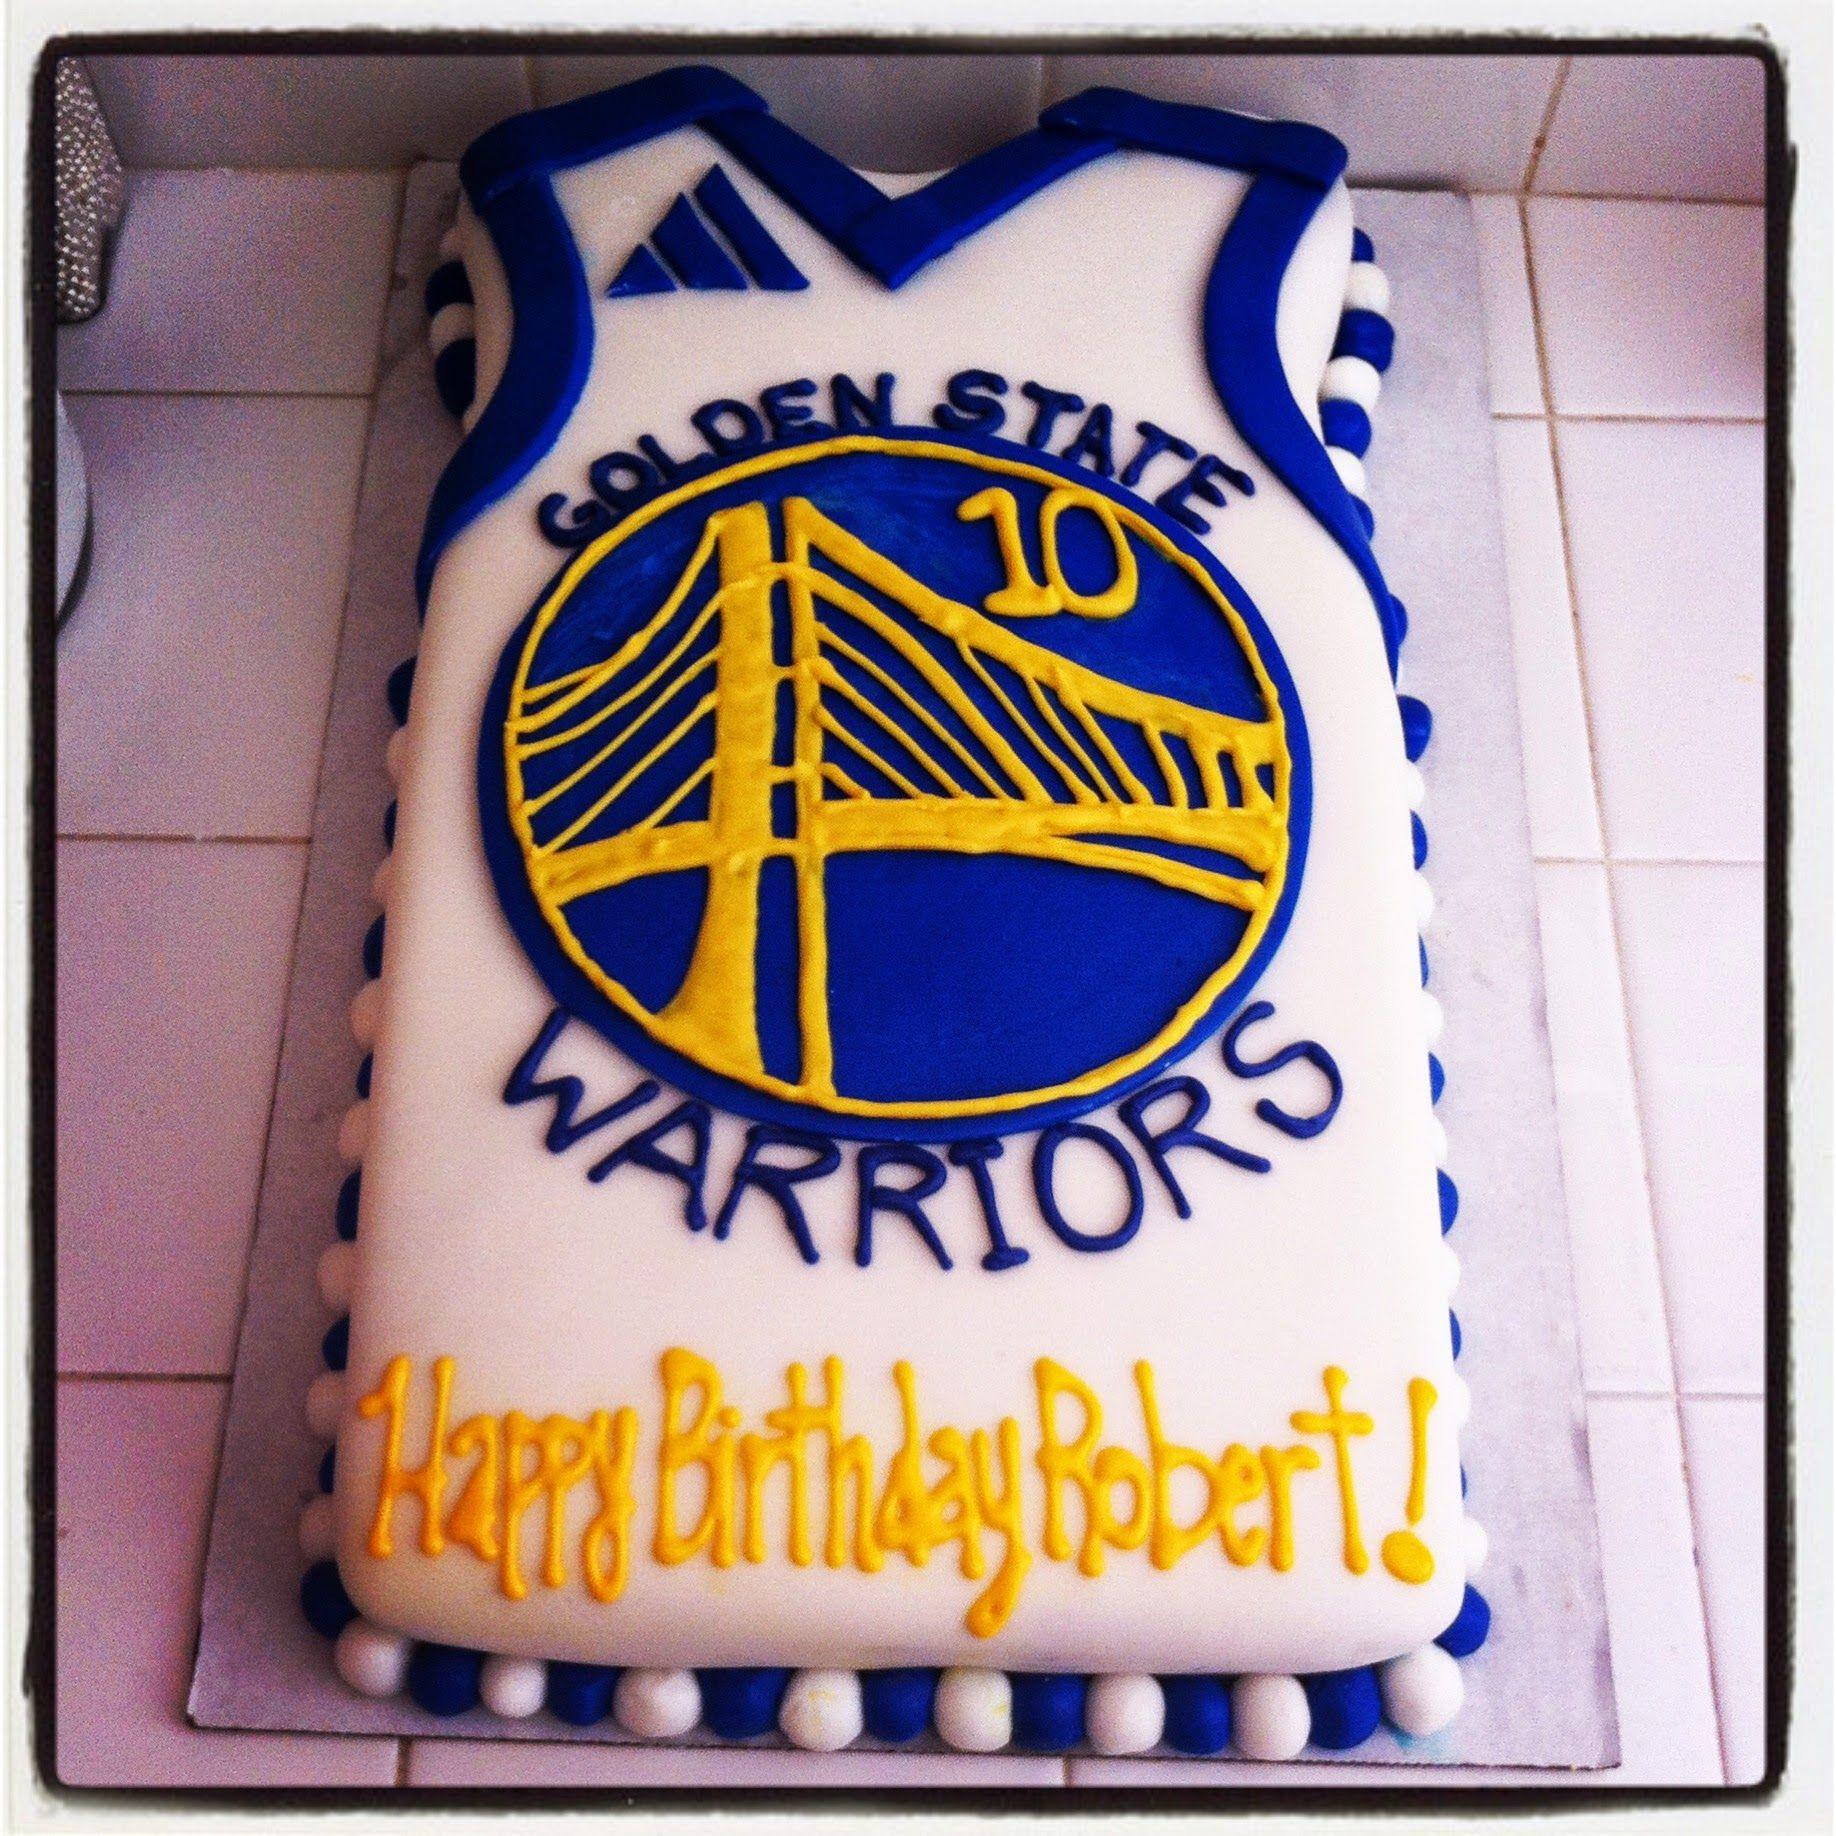 Jersey Cake